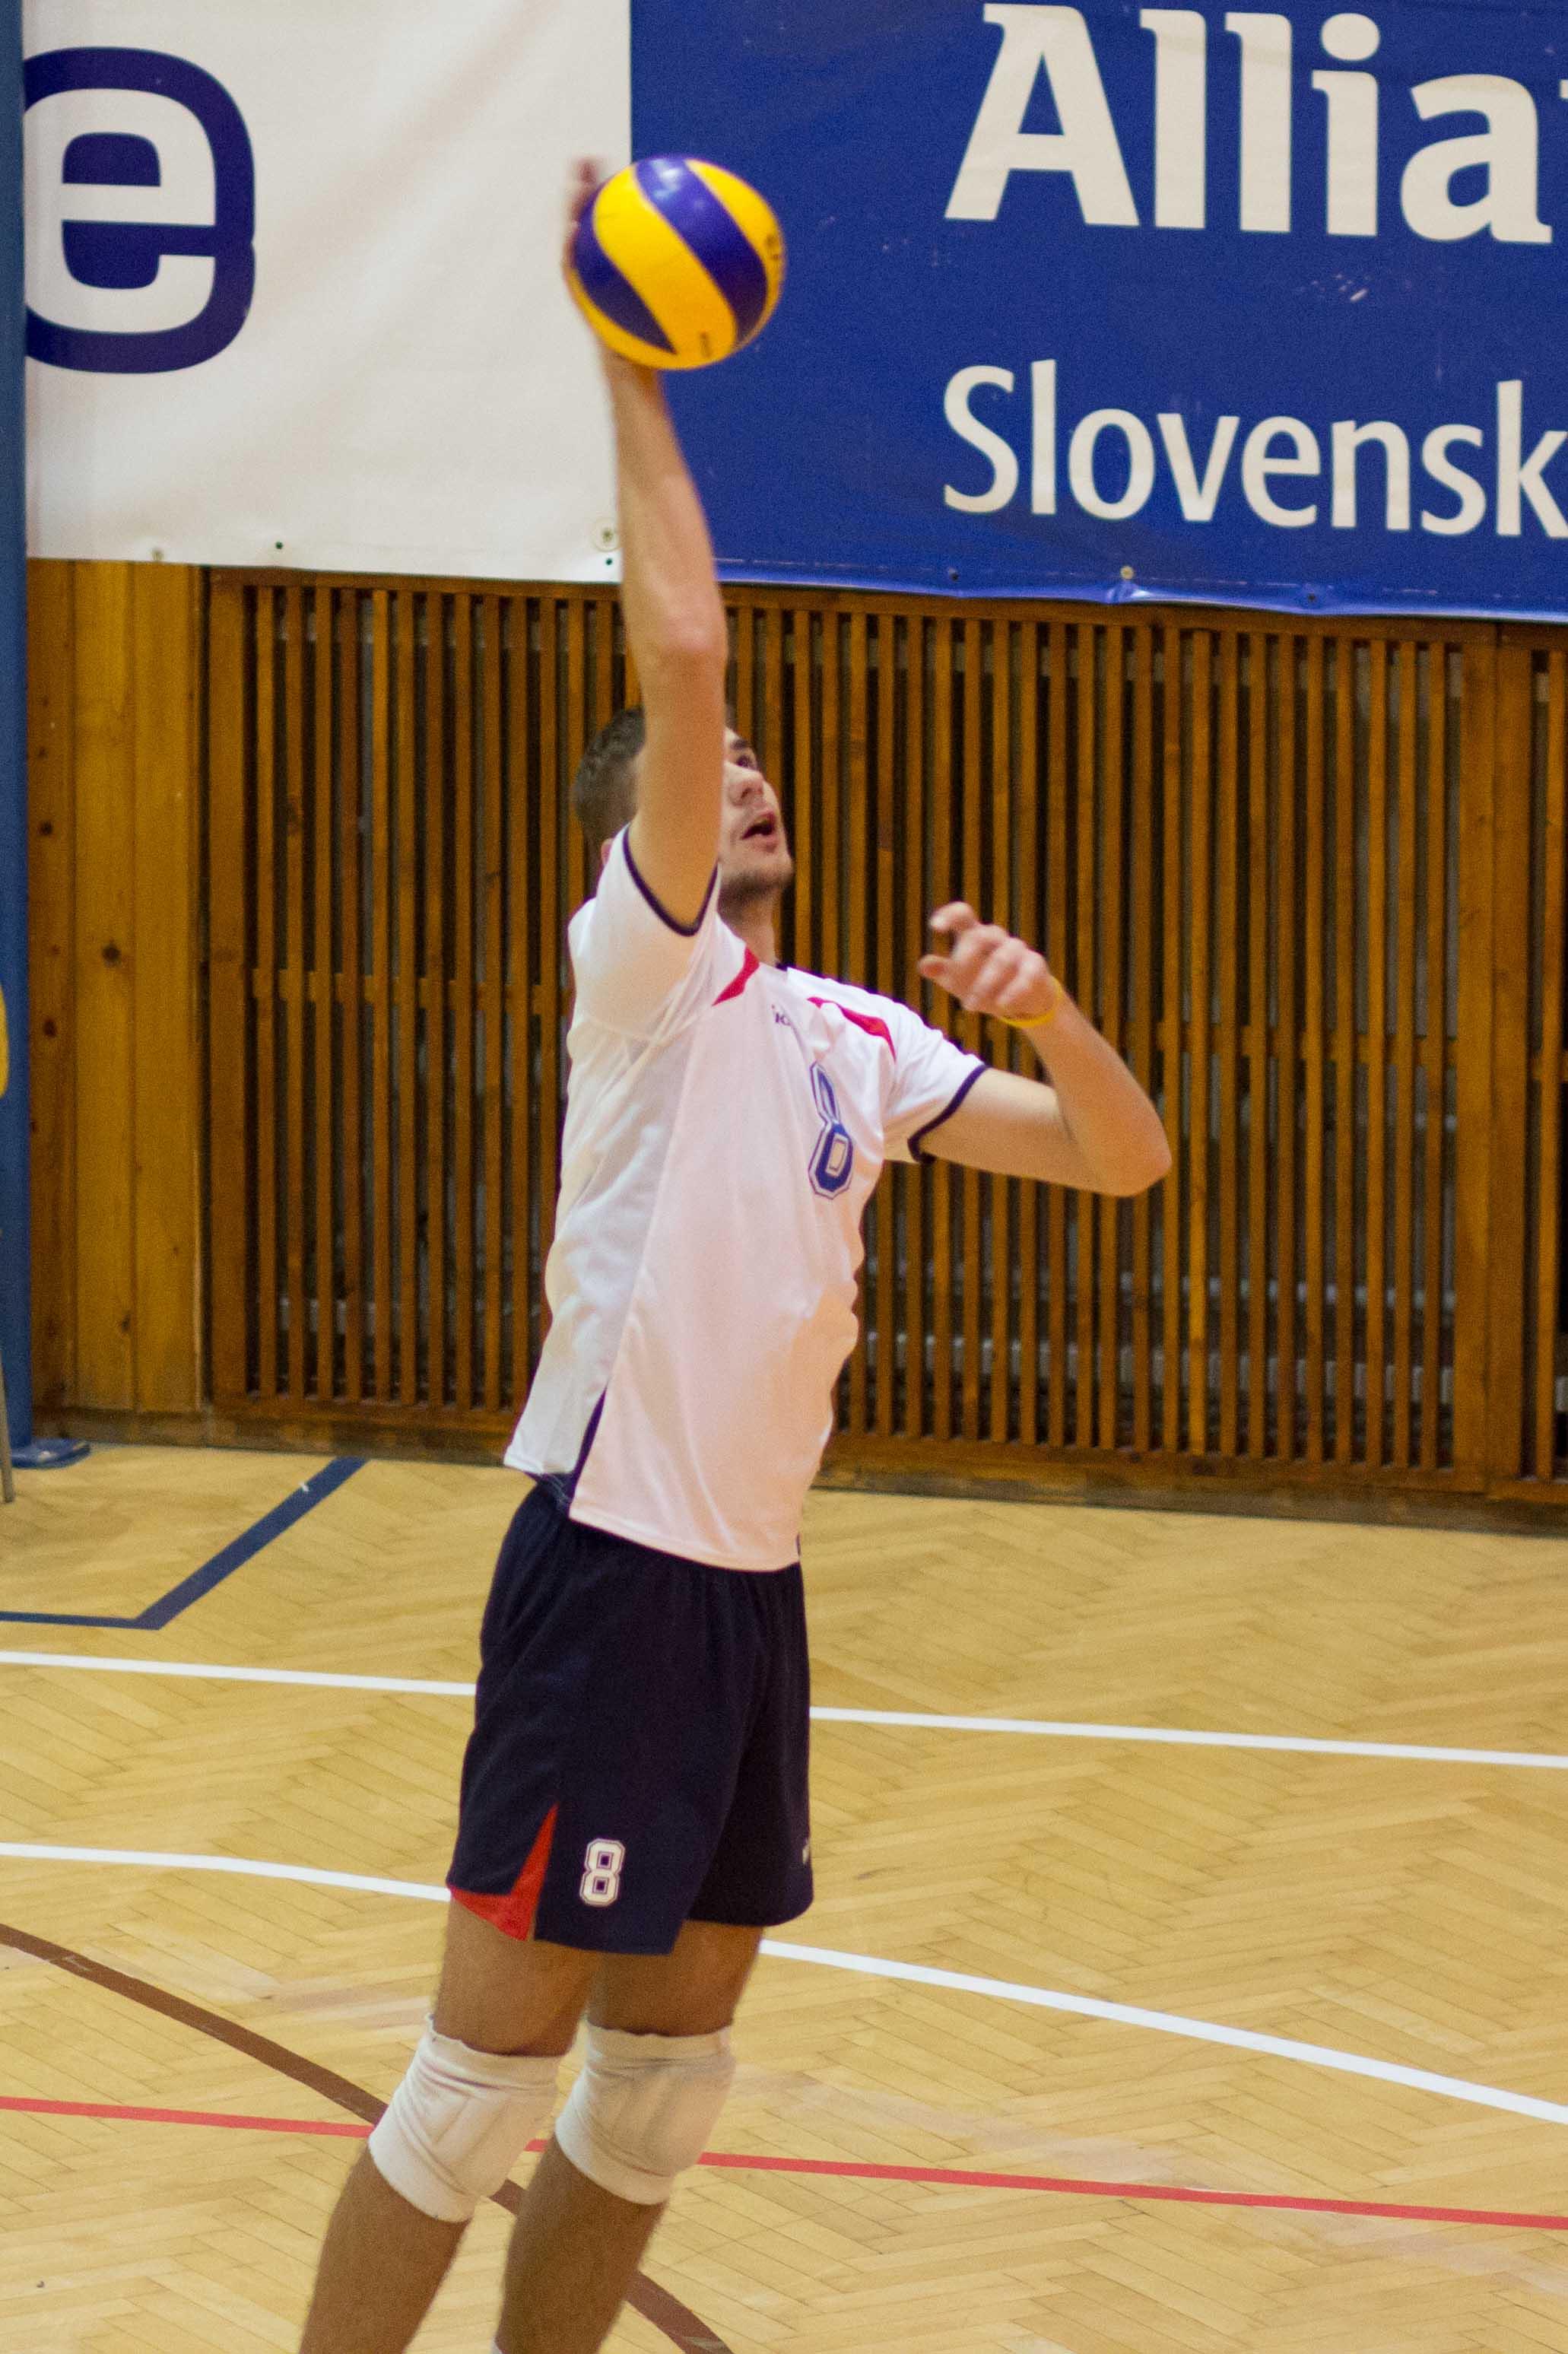 mvk-zvolen-stavbar-prievidza-2012-volejbal-20